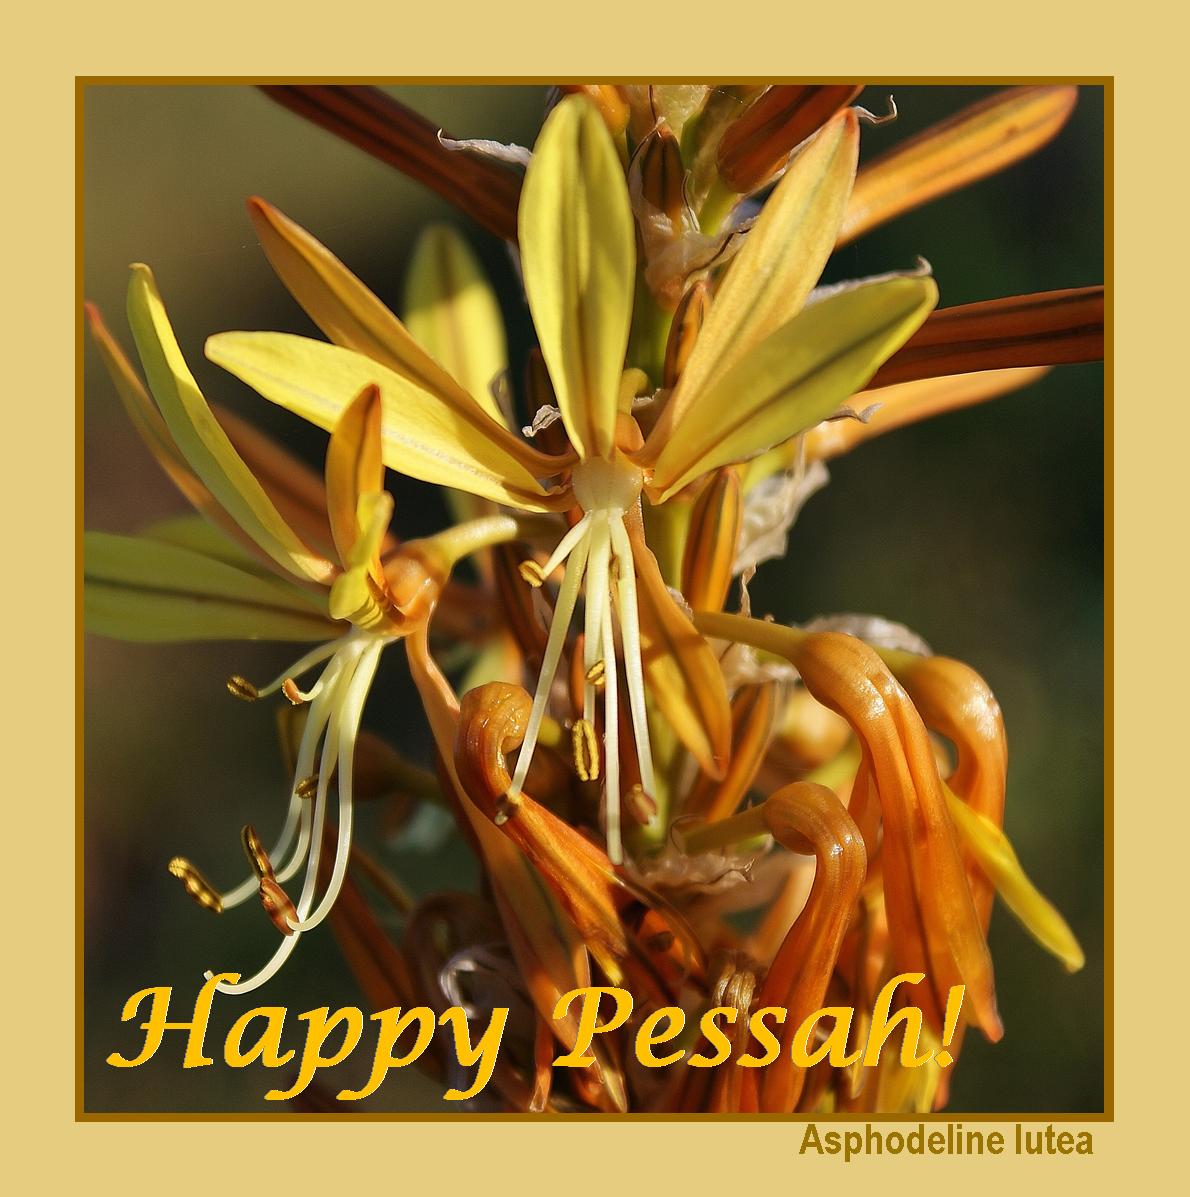 Happy Pessah!